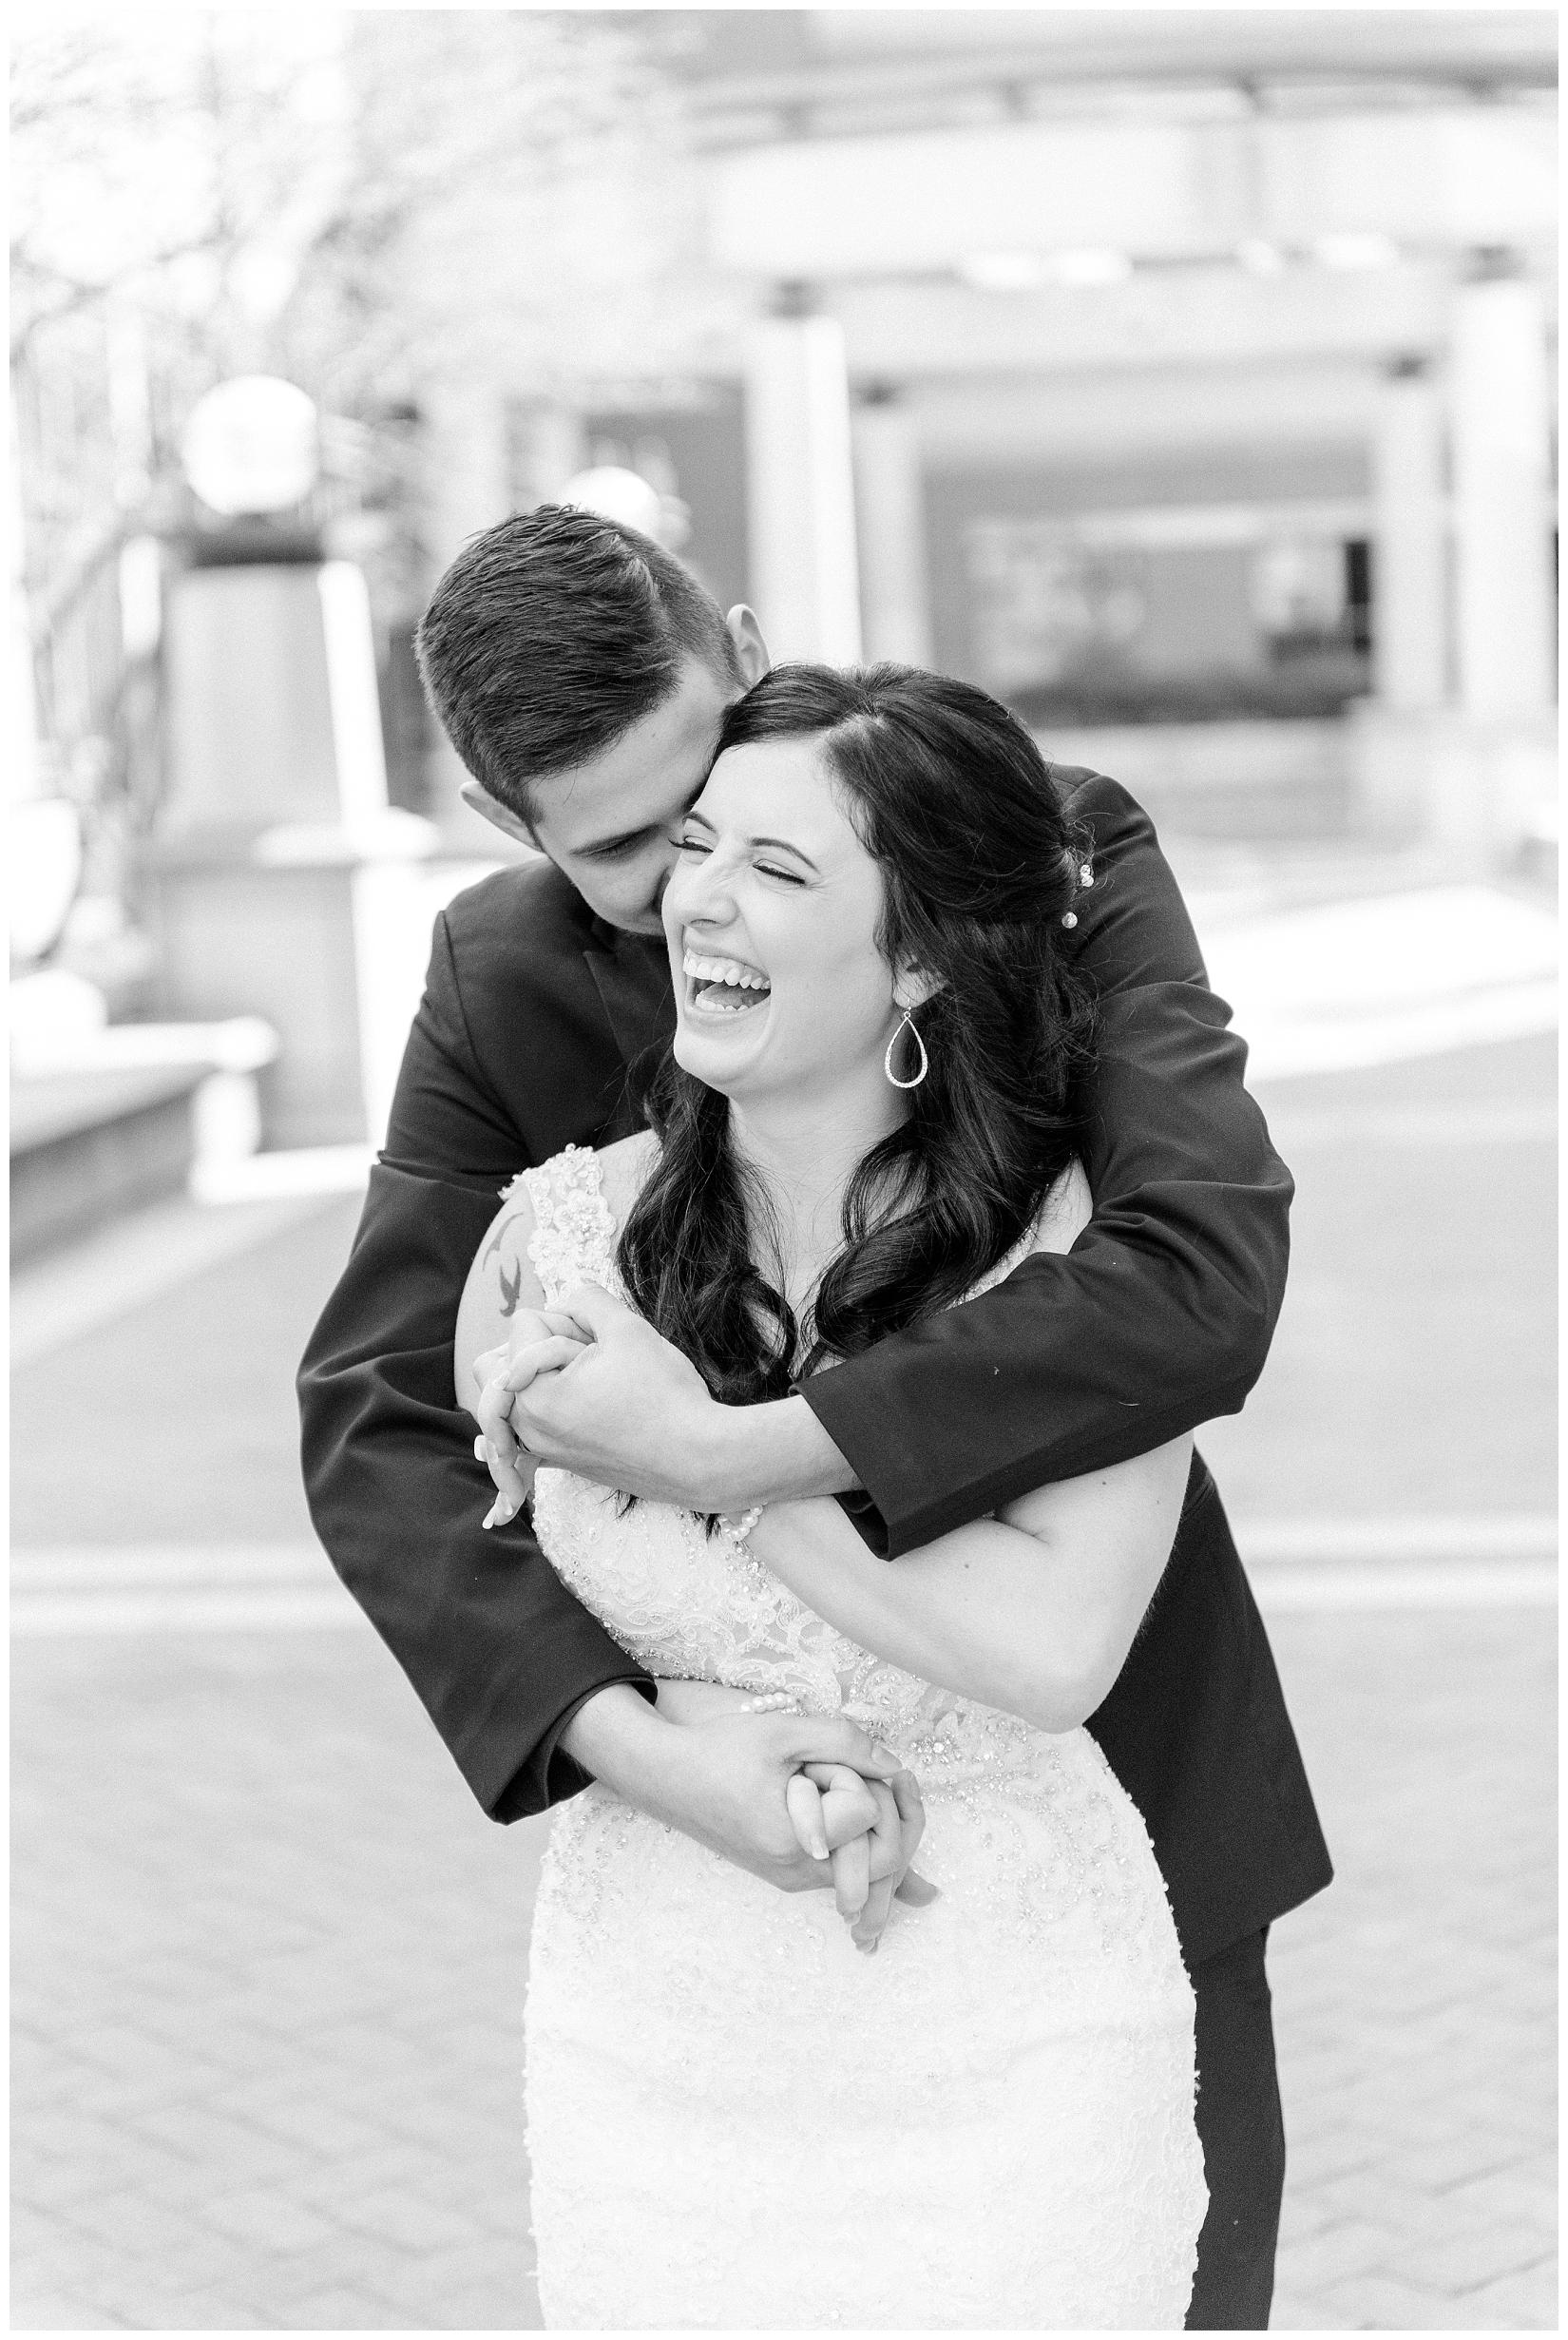 cat-alkire-wedding-photographer-indiana-chicago-indianapolis-fort-wayne_1112.jpg